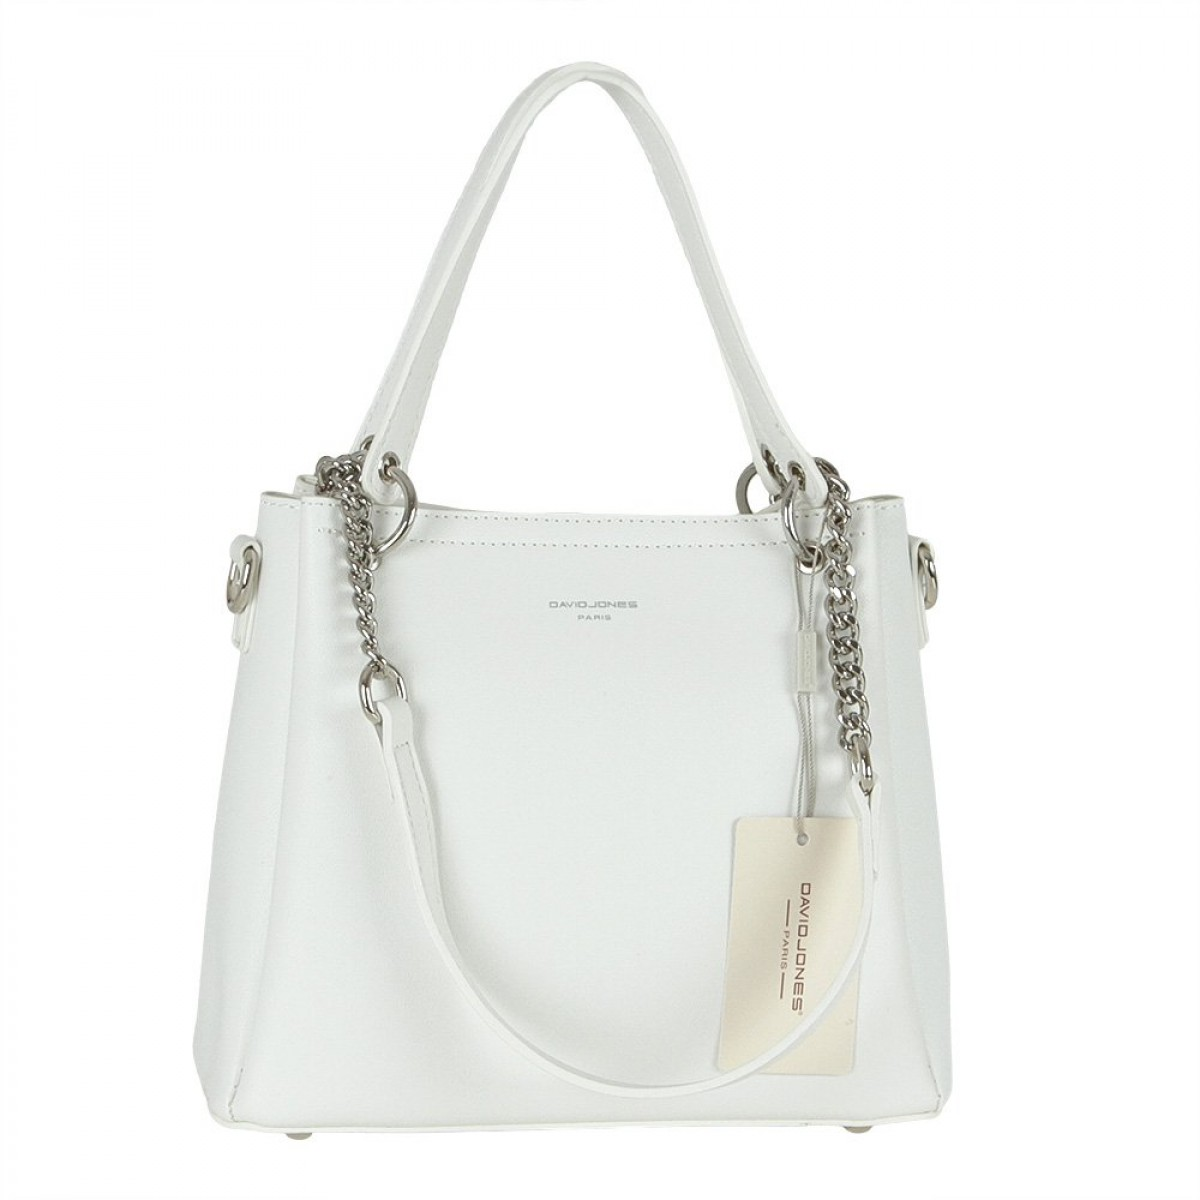 Жіноча сумка David Jones 6278-1 WHITE